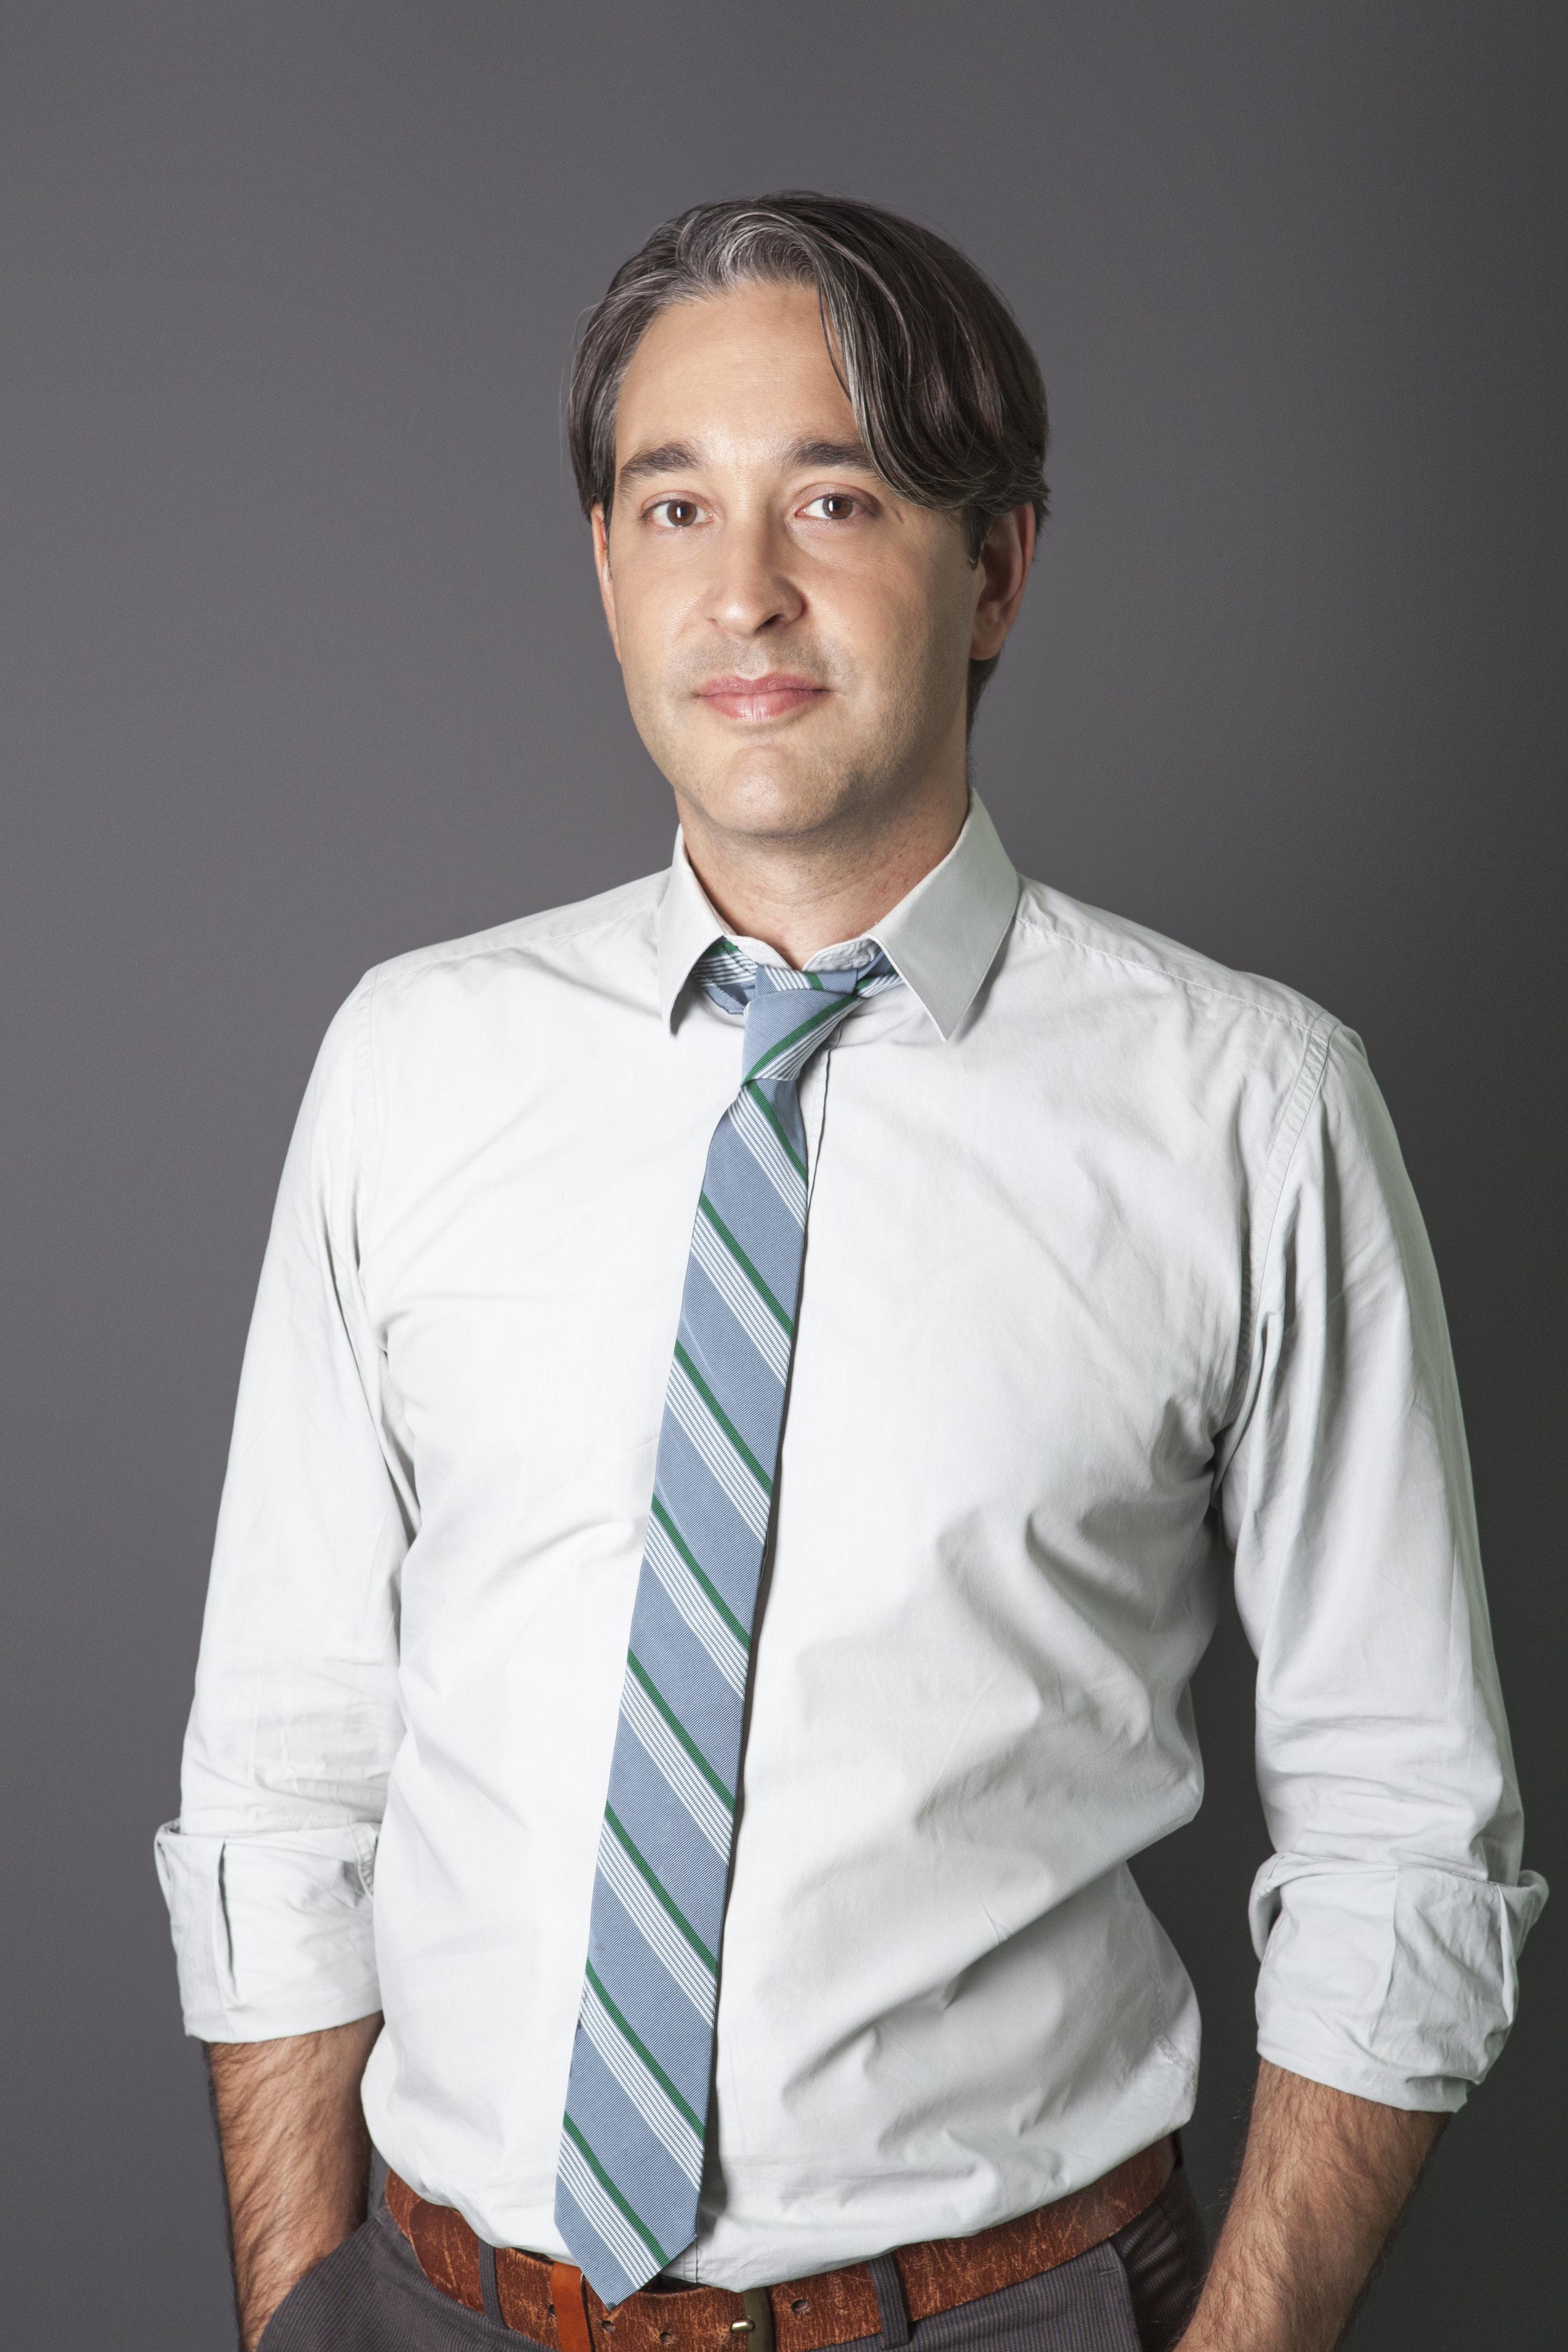 Jonah Greenberg